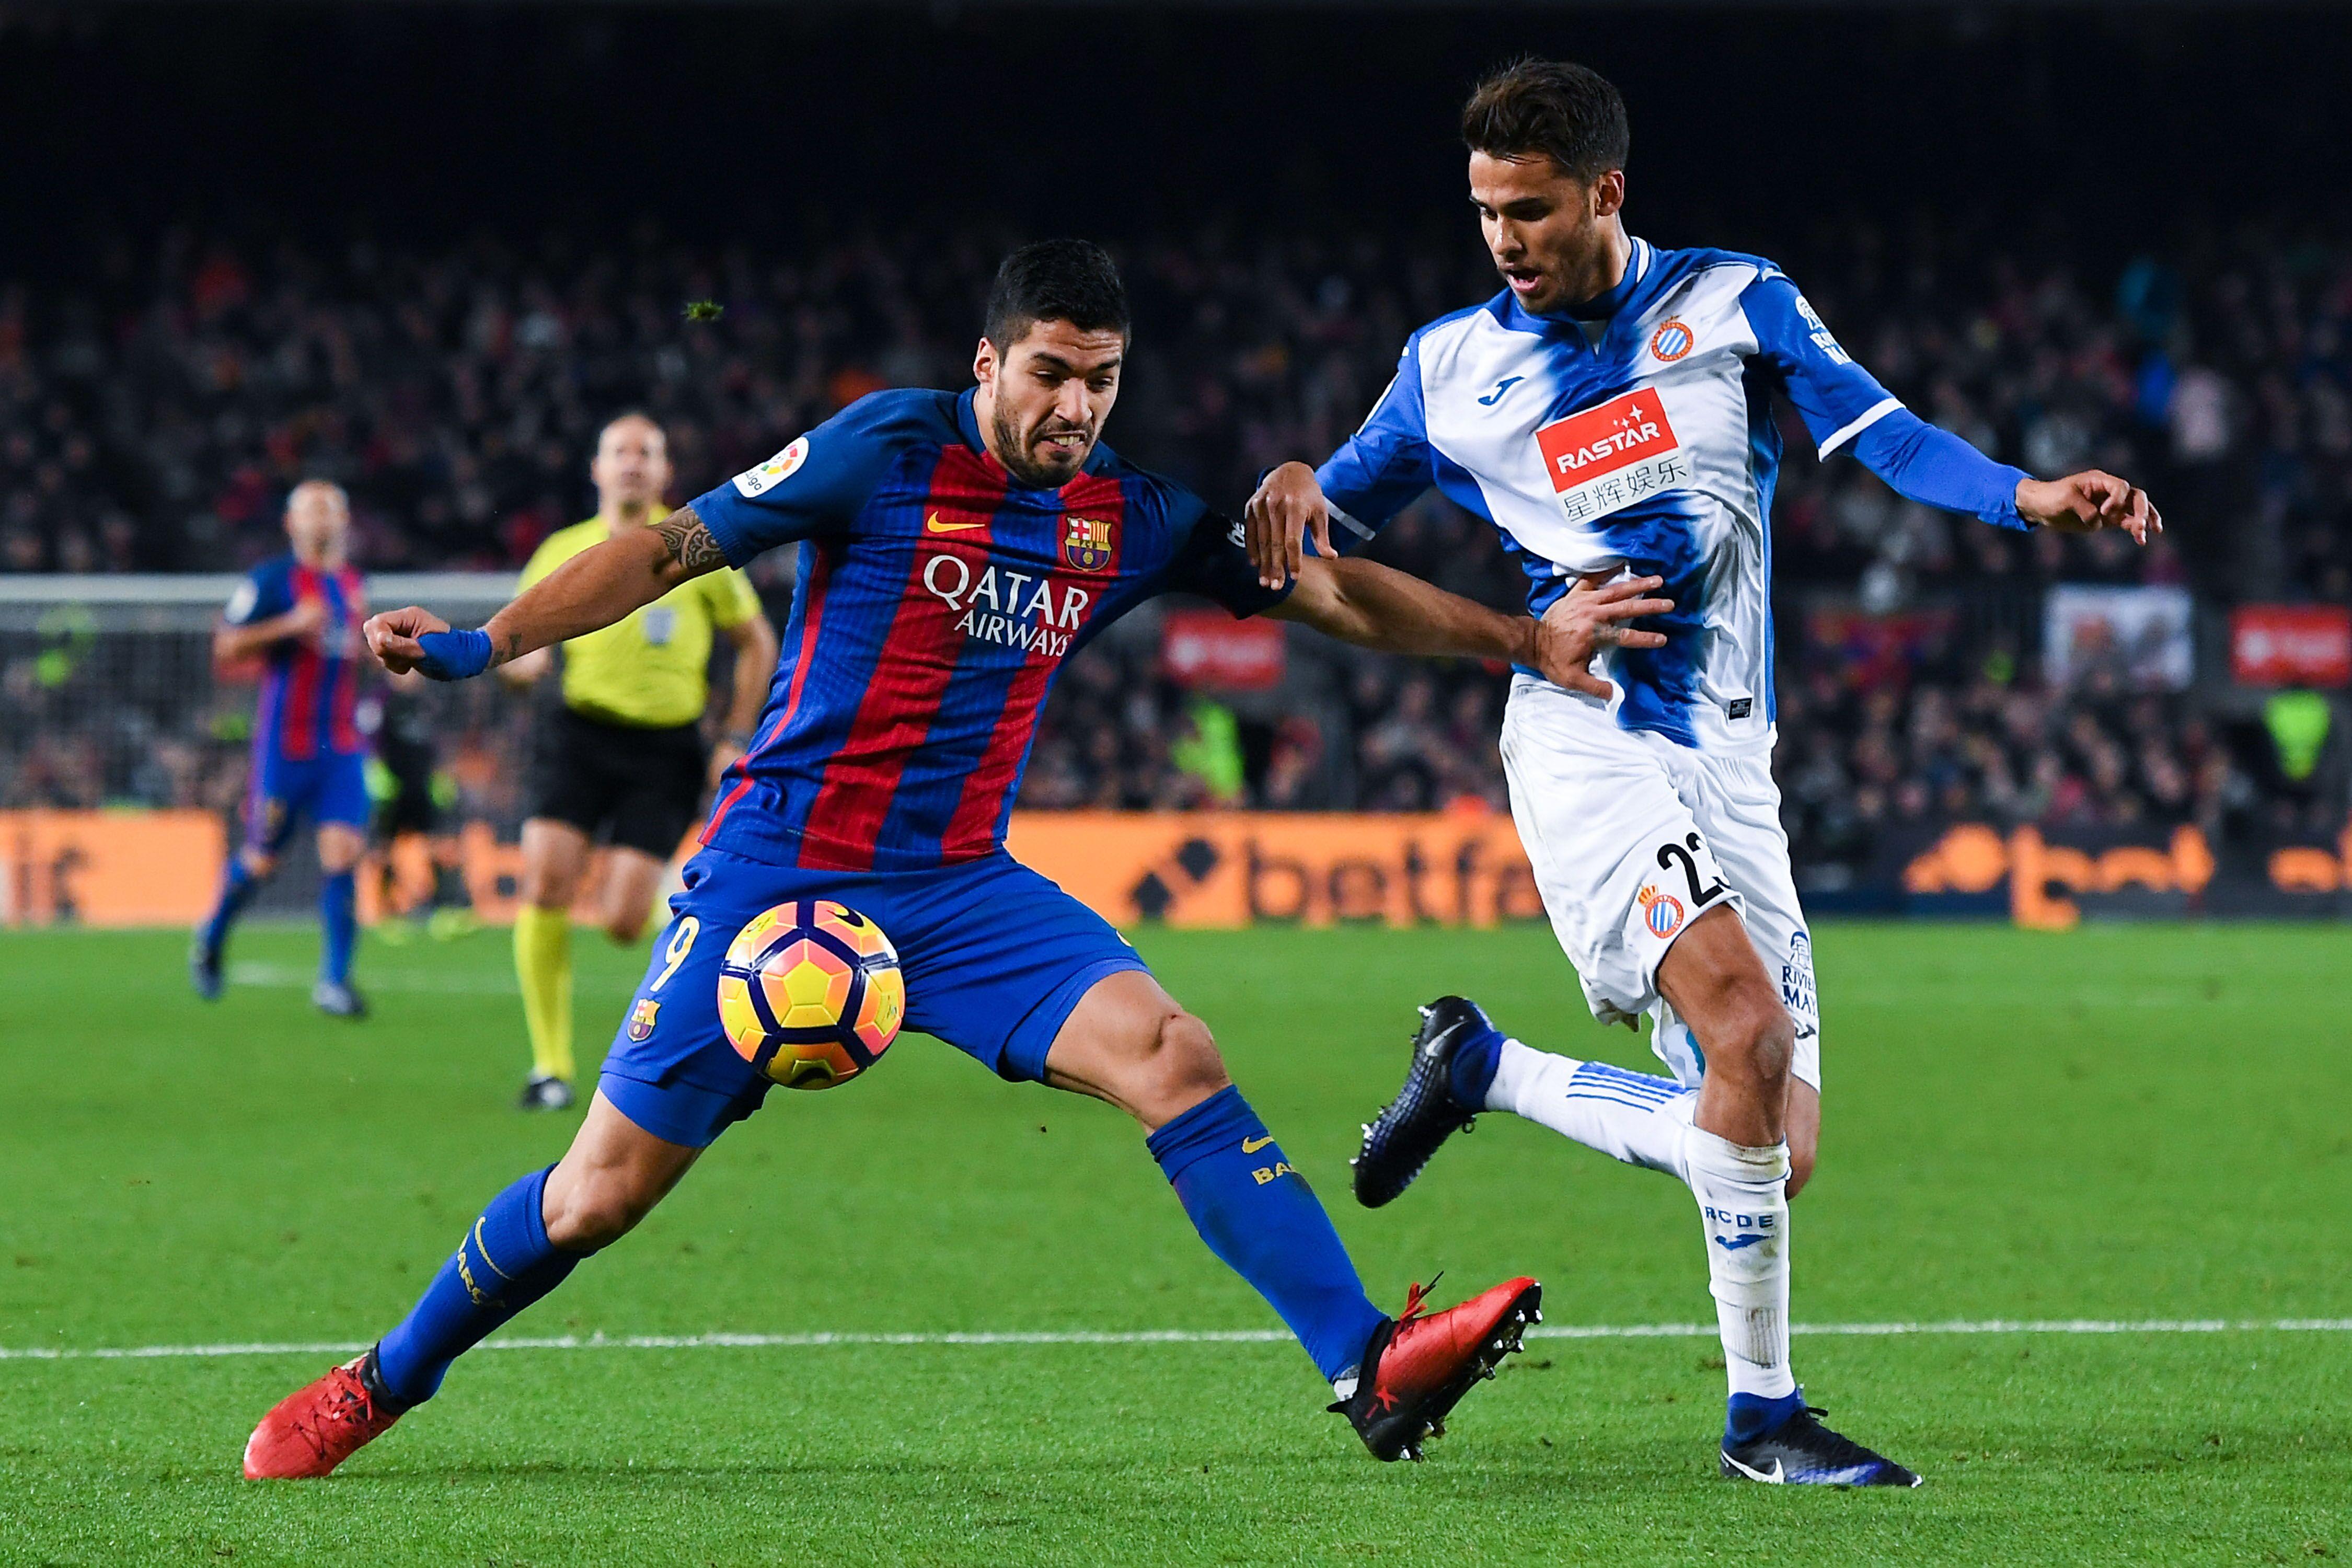 Barcelona Vs Espanyol Live Stream